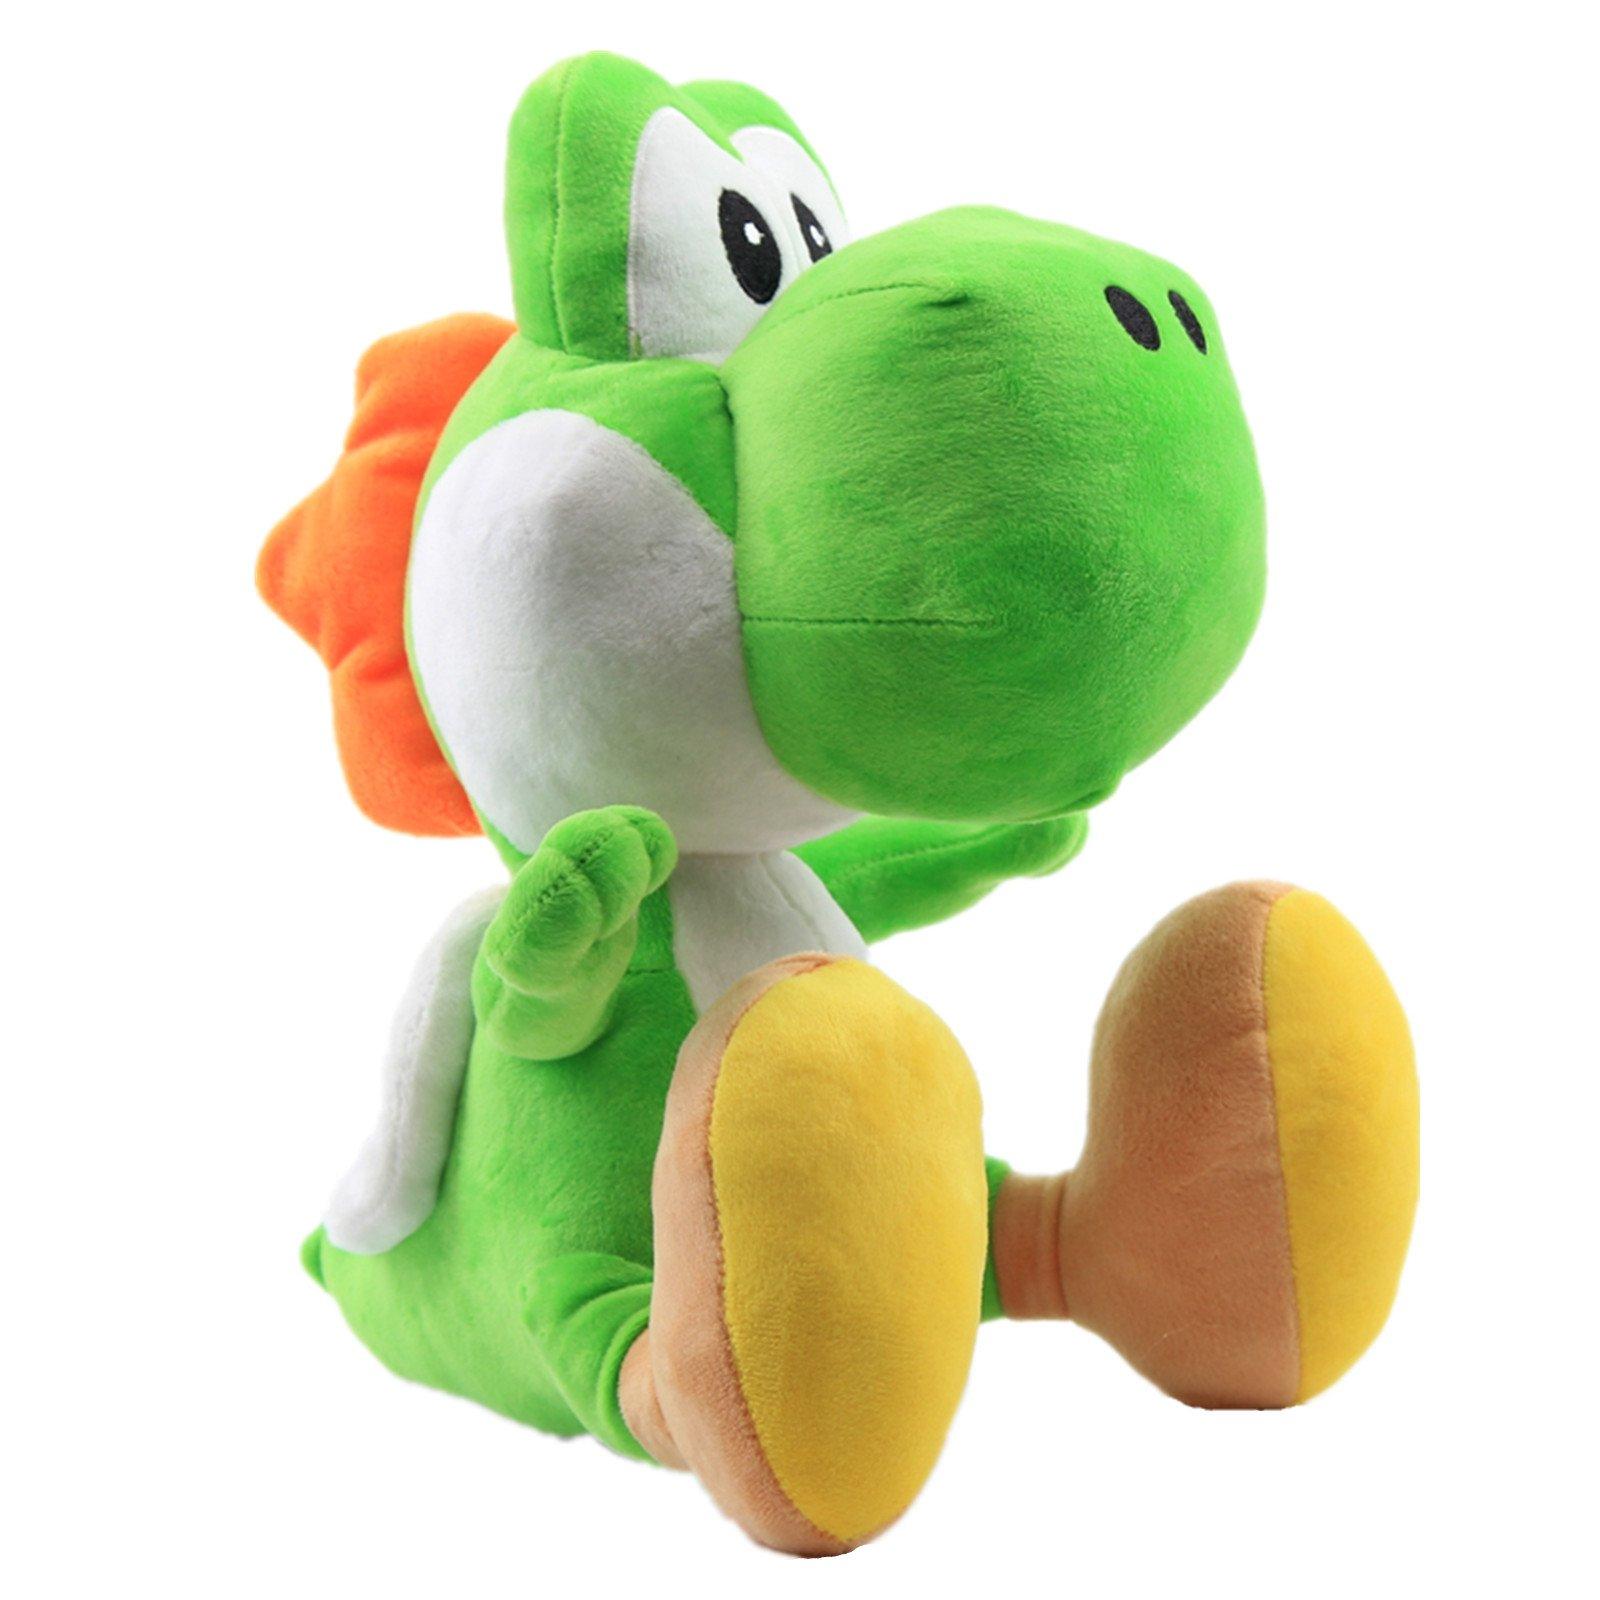 uiuoutoy Super Mario Bros. 12'' Green Yoshi Stuffed Plush by uiuoutoy